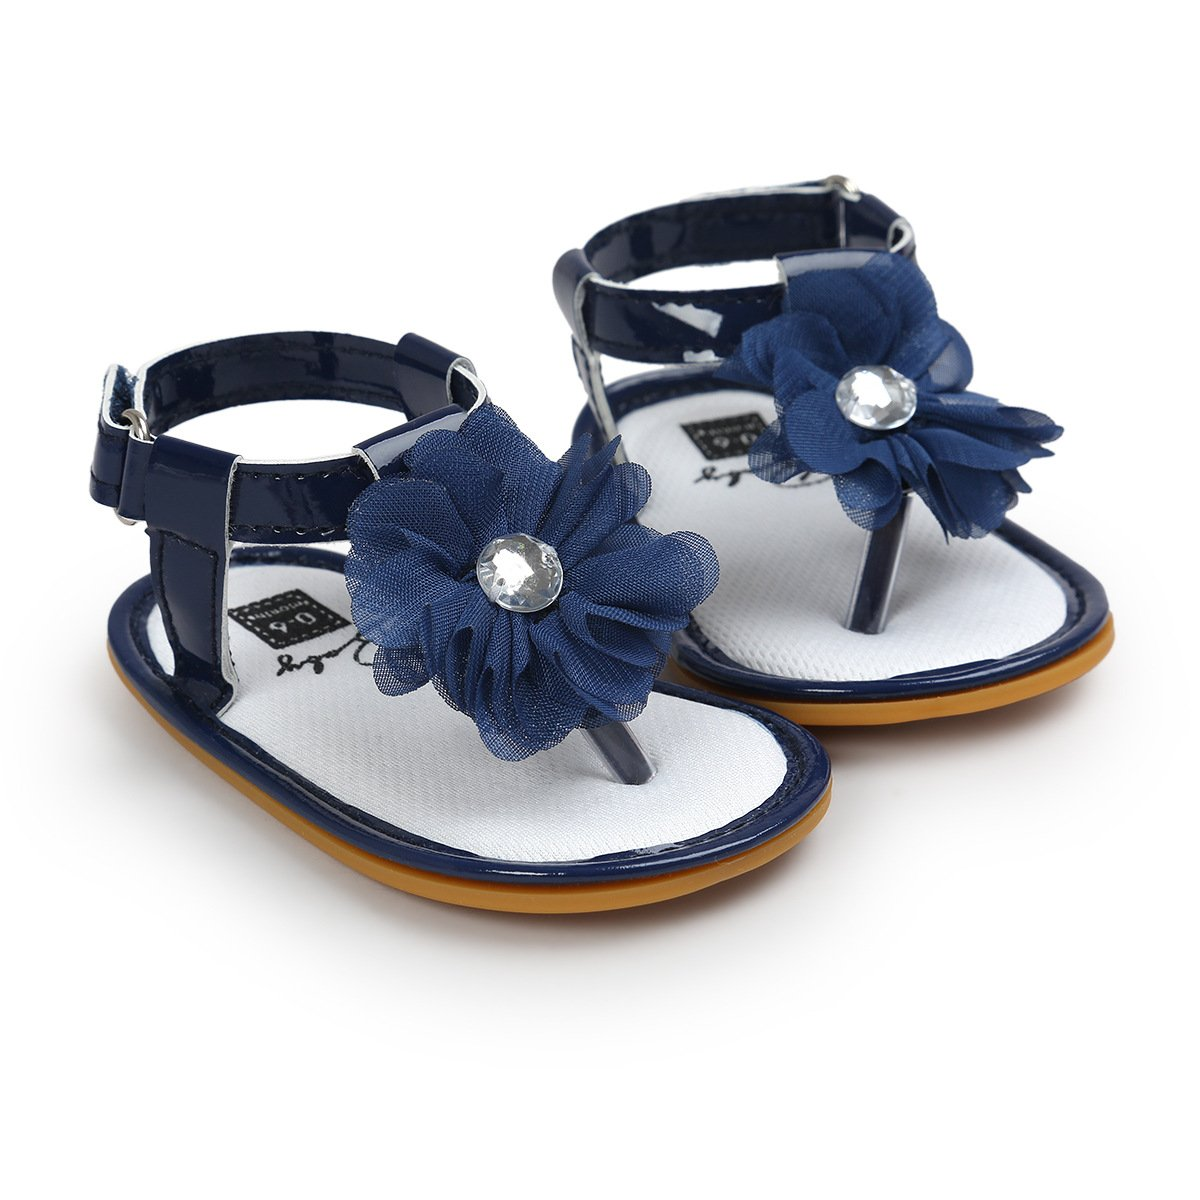 LAFEGEN Baby Girls Shoes Soft Anti-Slip Rubber Sole Flower T-Strap Summer Sandals Newborn Toddlers First Walkers Shoes